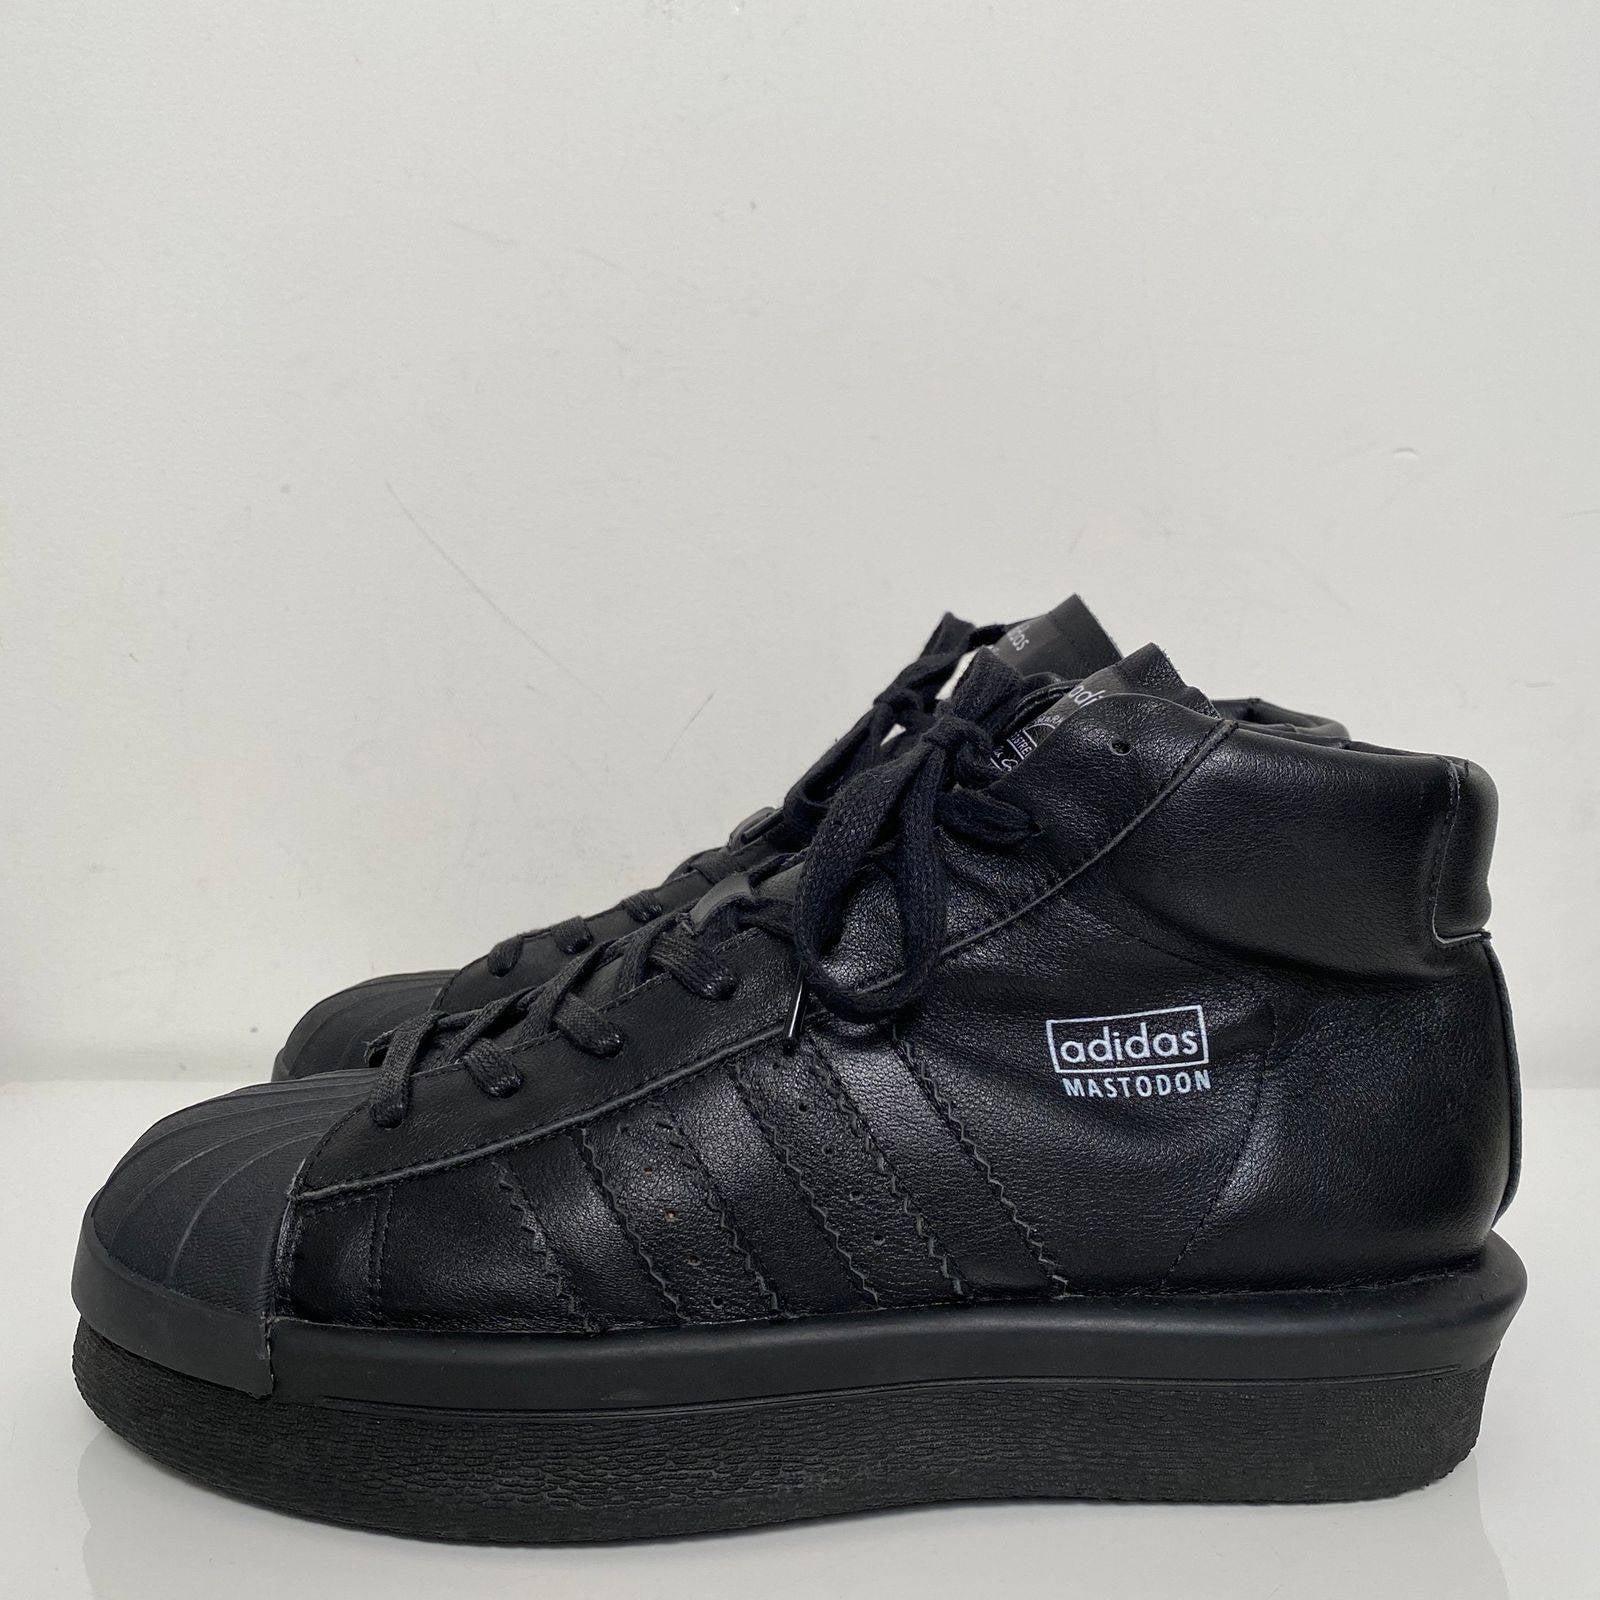 Adidas Rick Owens Mastodon Black